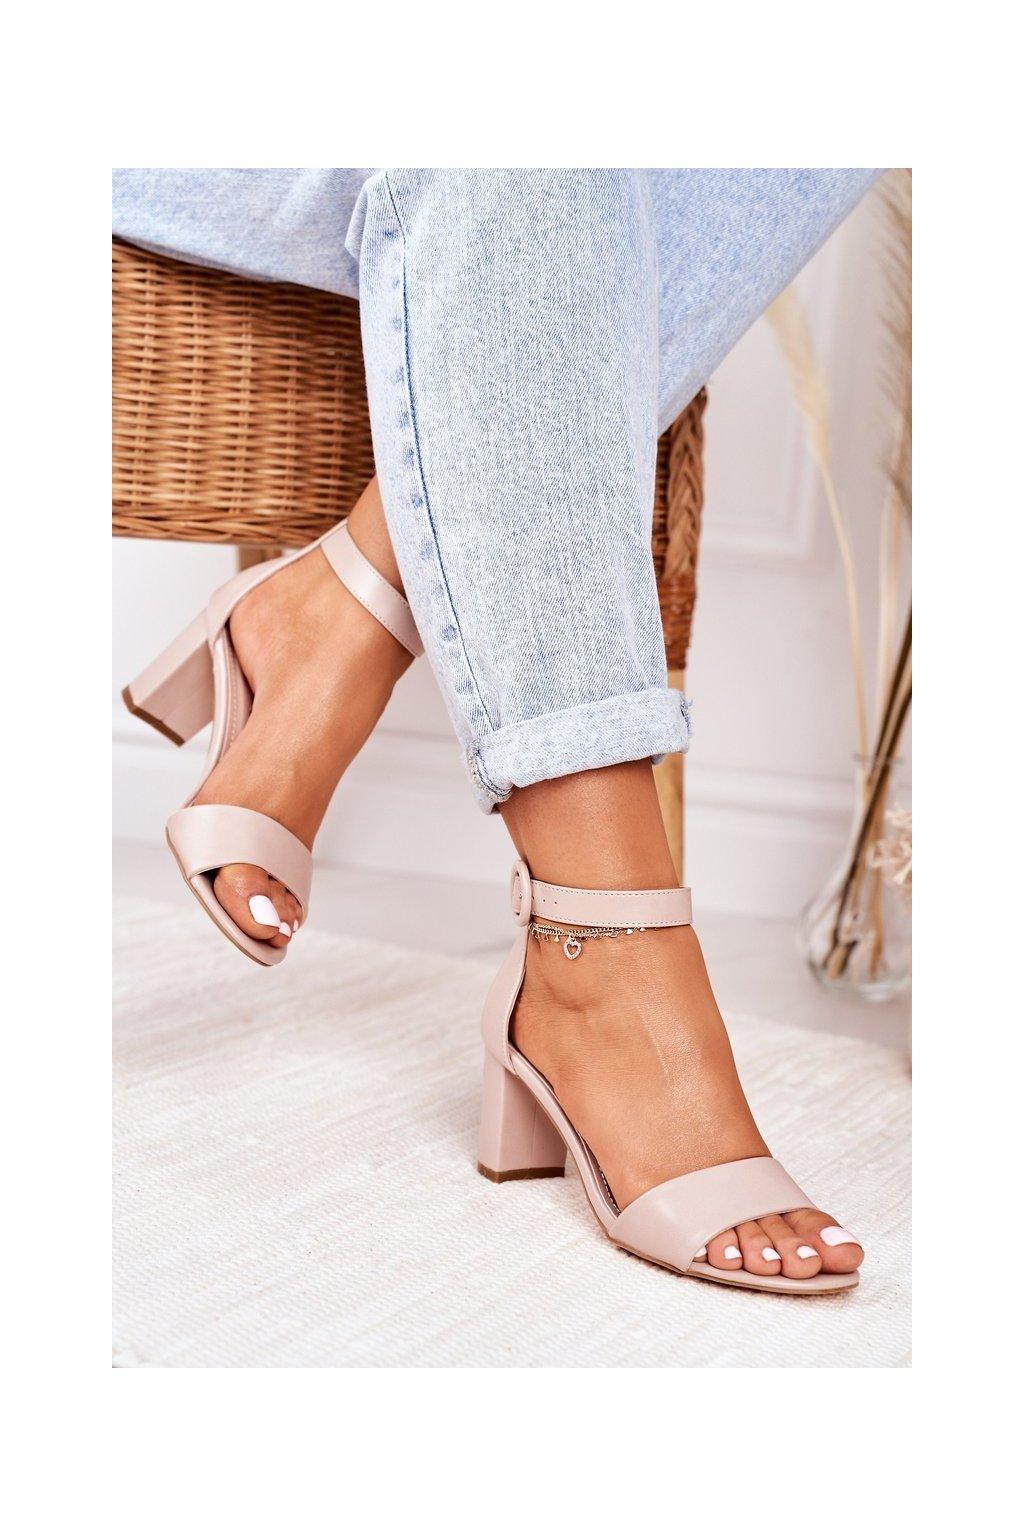 Dámske sandále na podpätku farba hnedá kód obuvi 20SD98-1617 PINK BEIGE